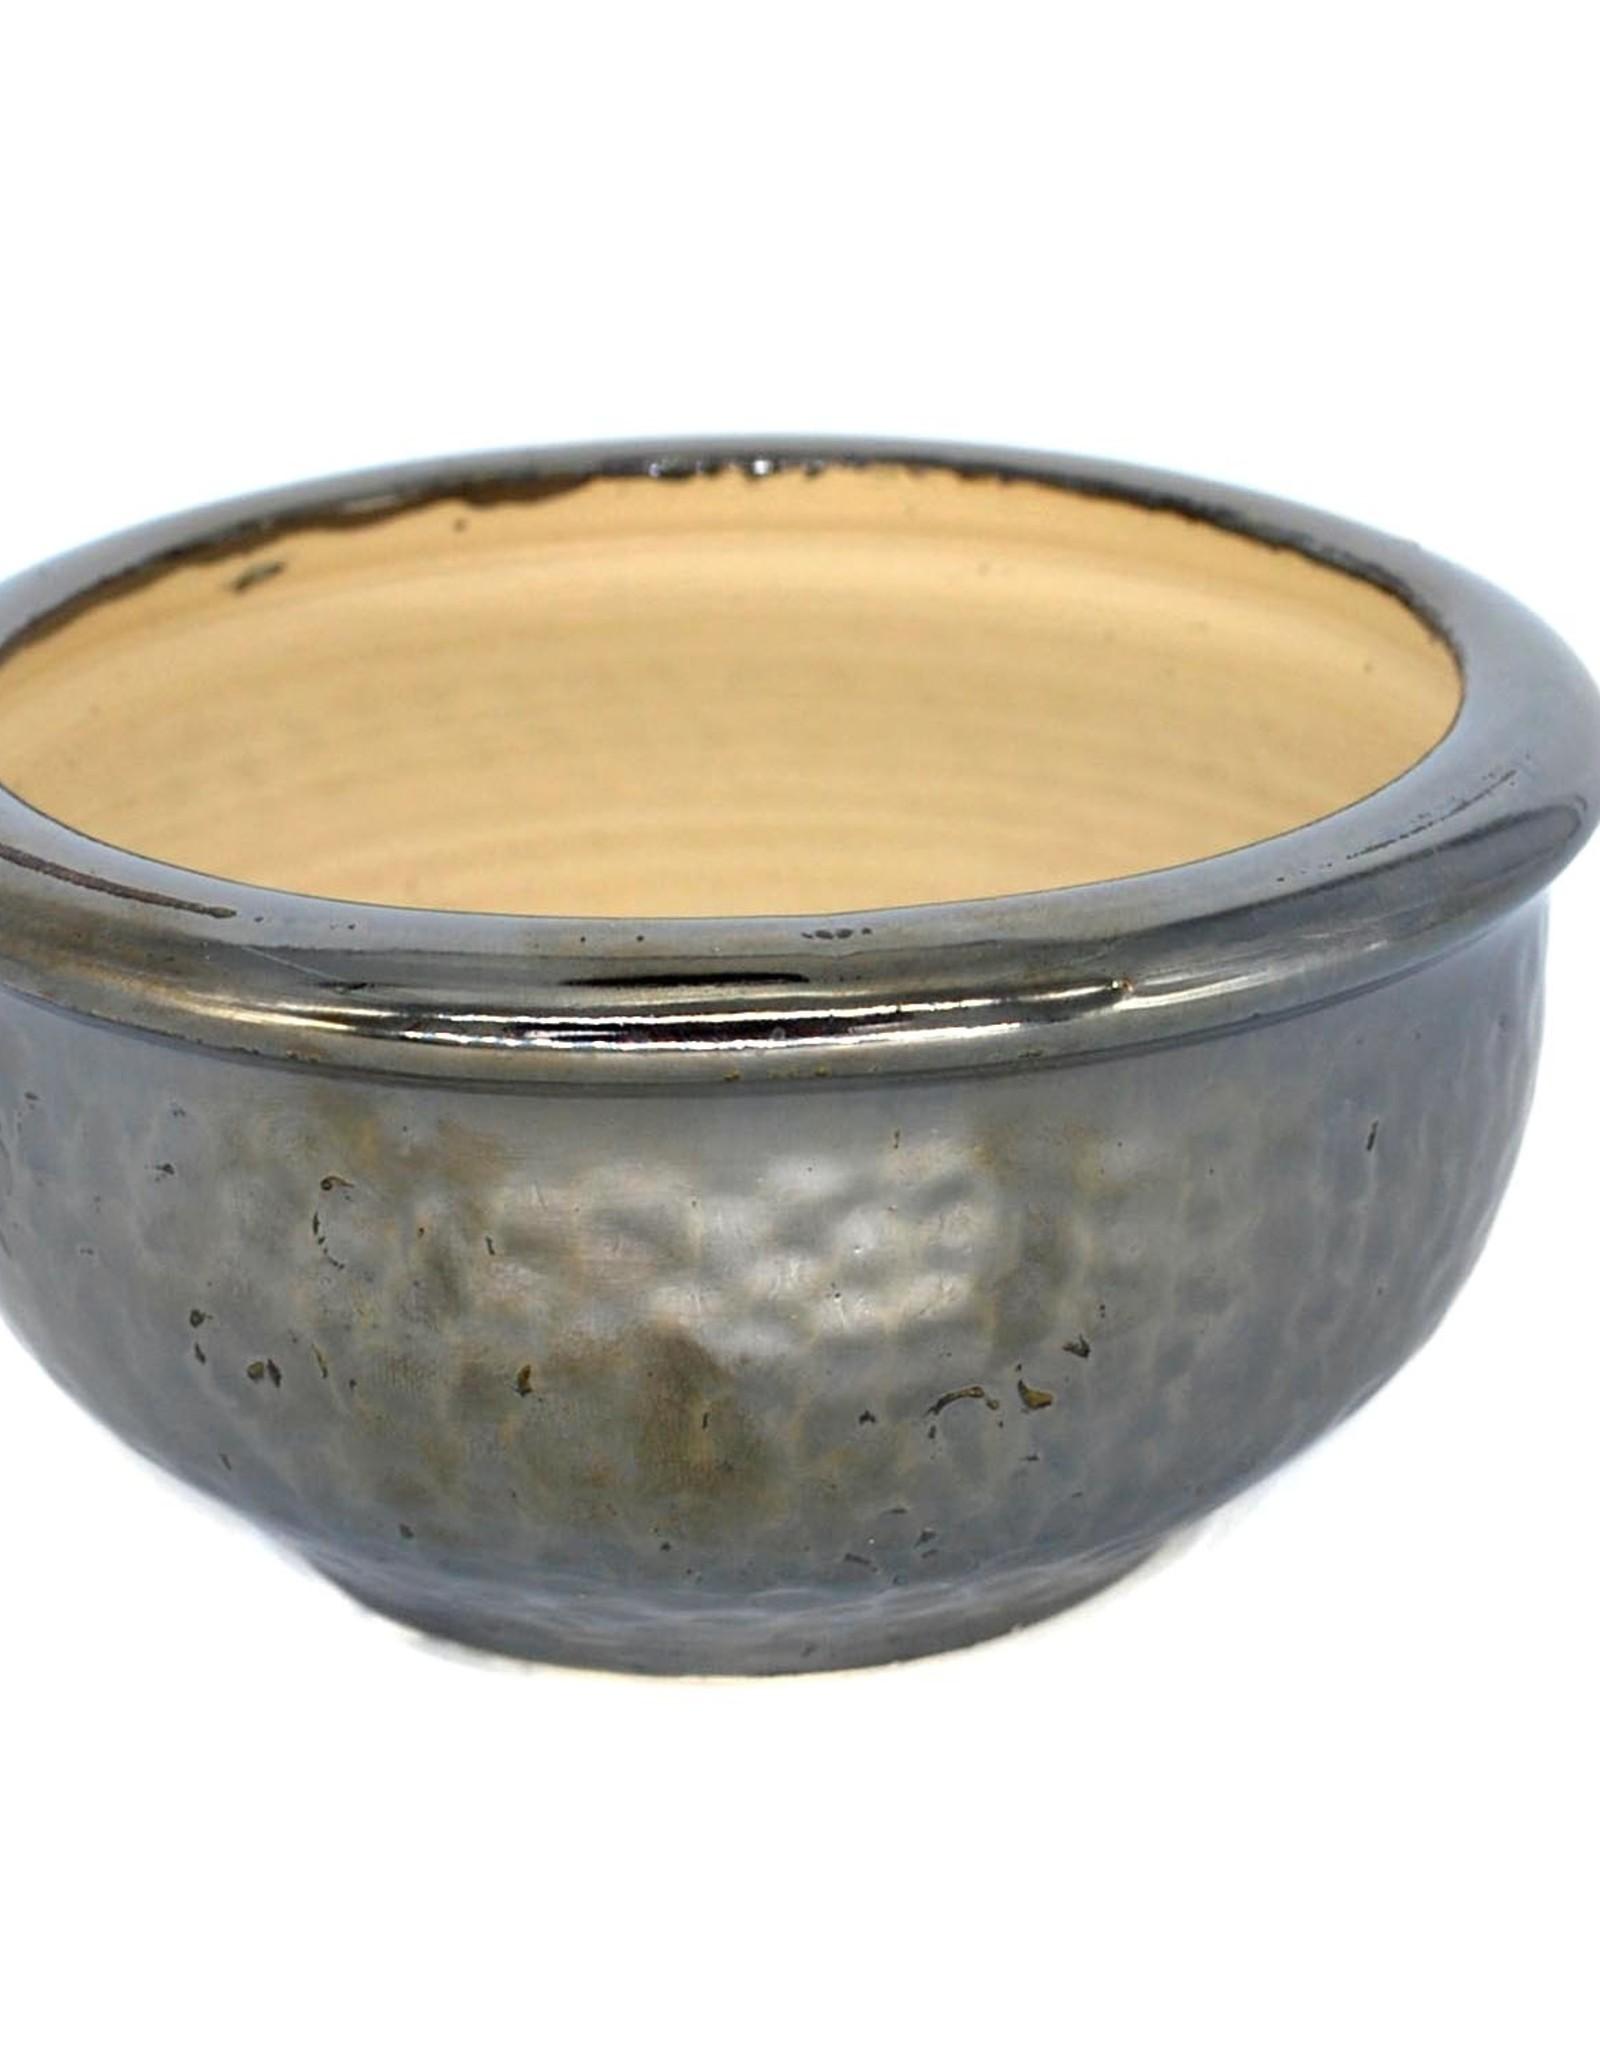 Metallic silver dimpled ceramic plant pot by Ronda Ruby Ceramics